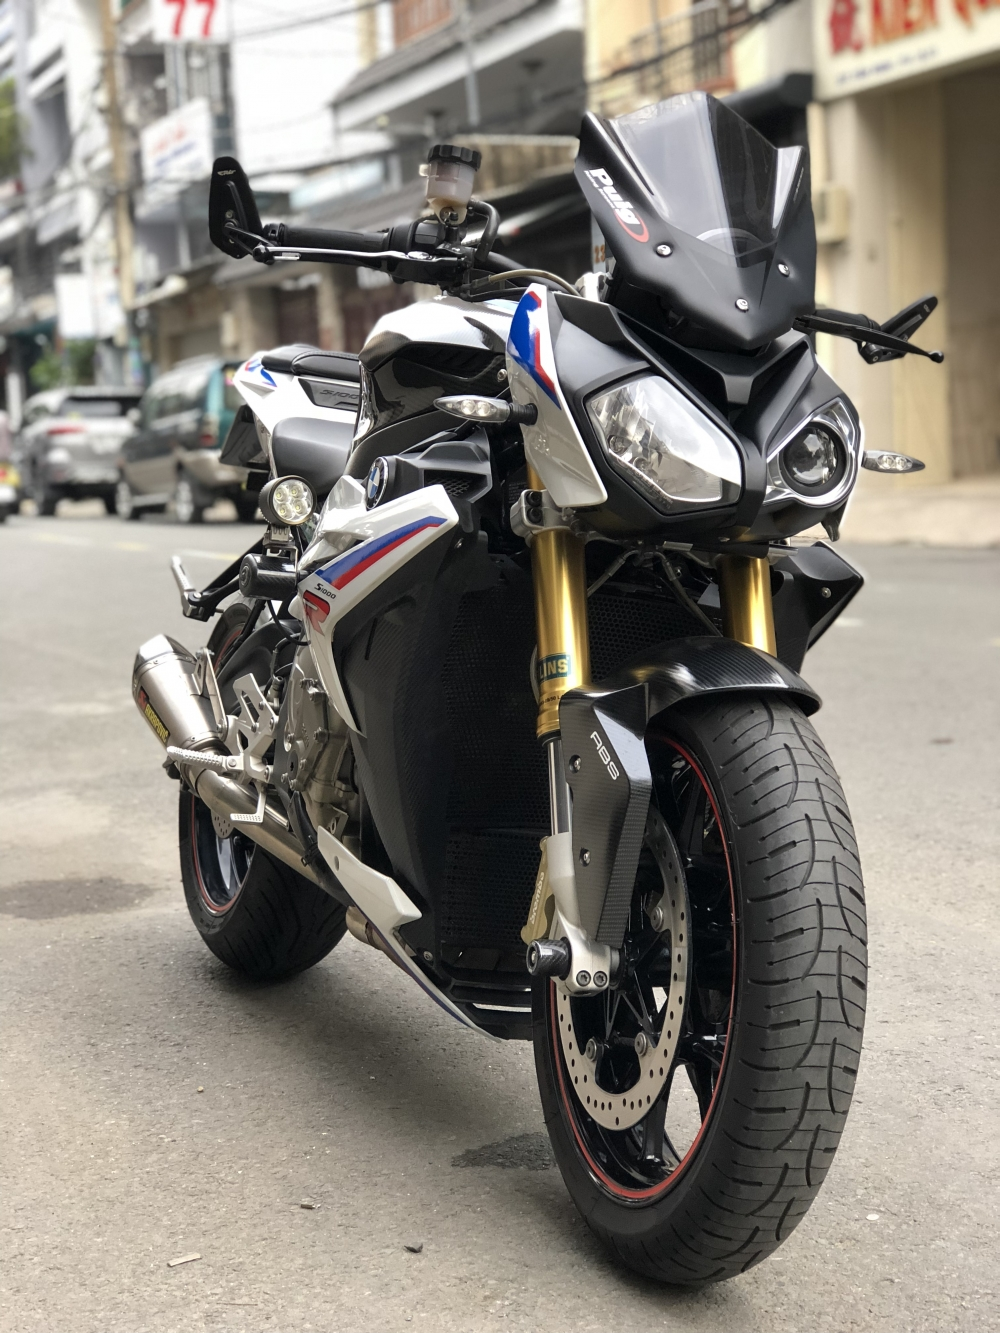 __Ban BMW S1000R ABS date 82014 phien ban Chau Au Full Opstionodo hon 15000km xe dep ngay chu - 2